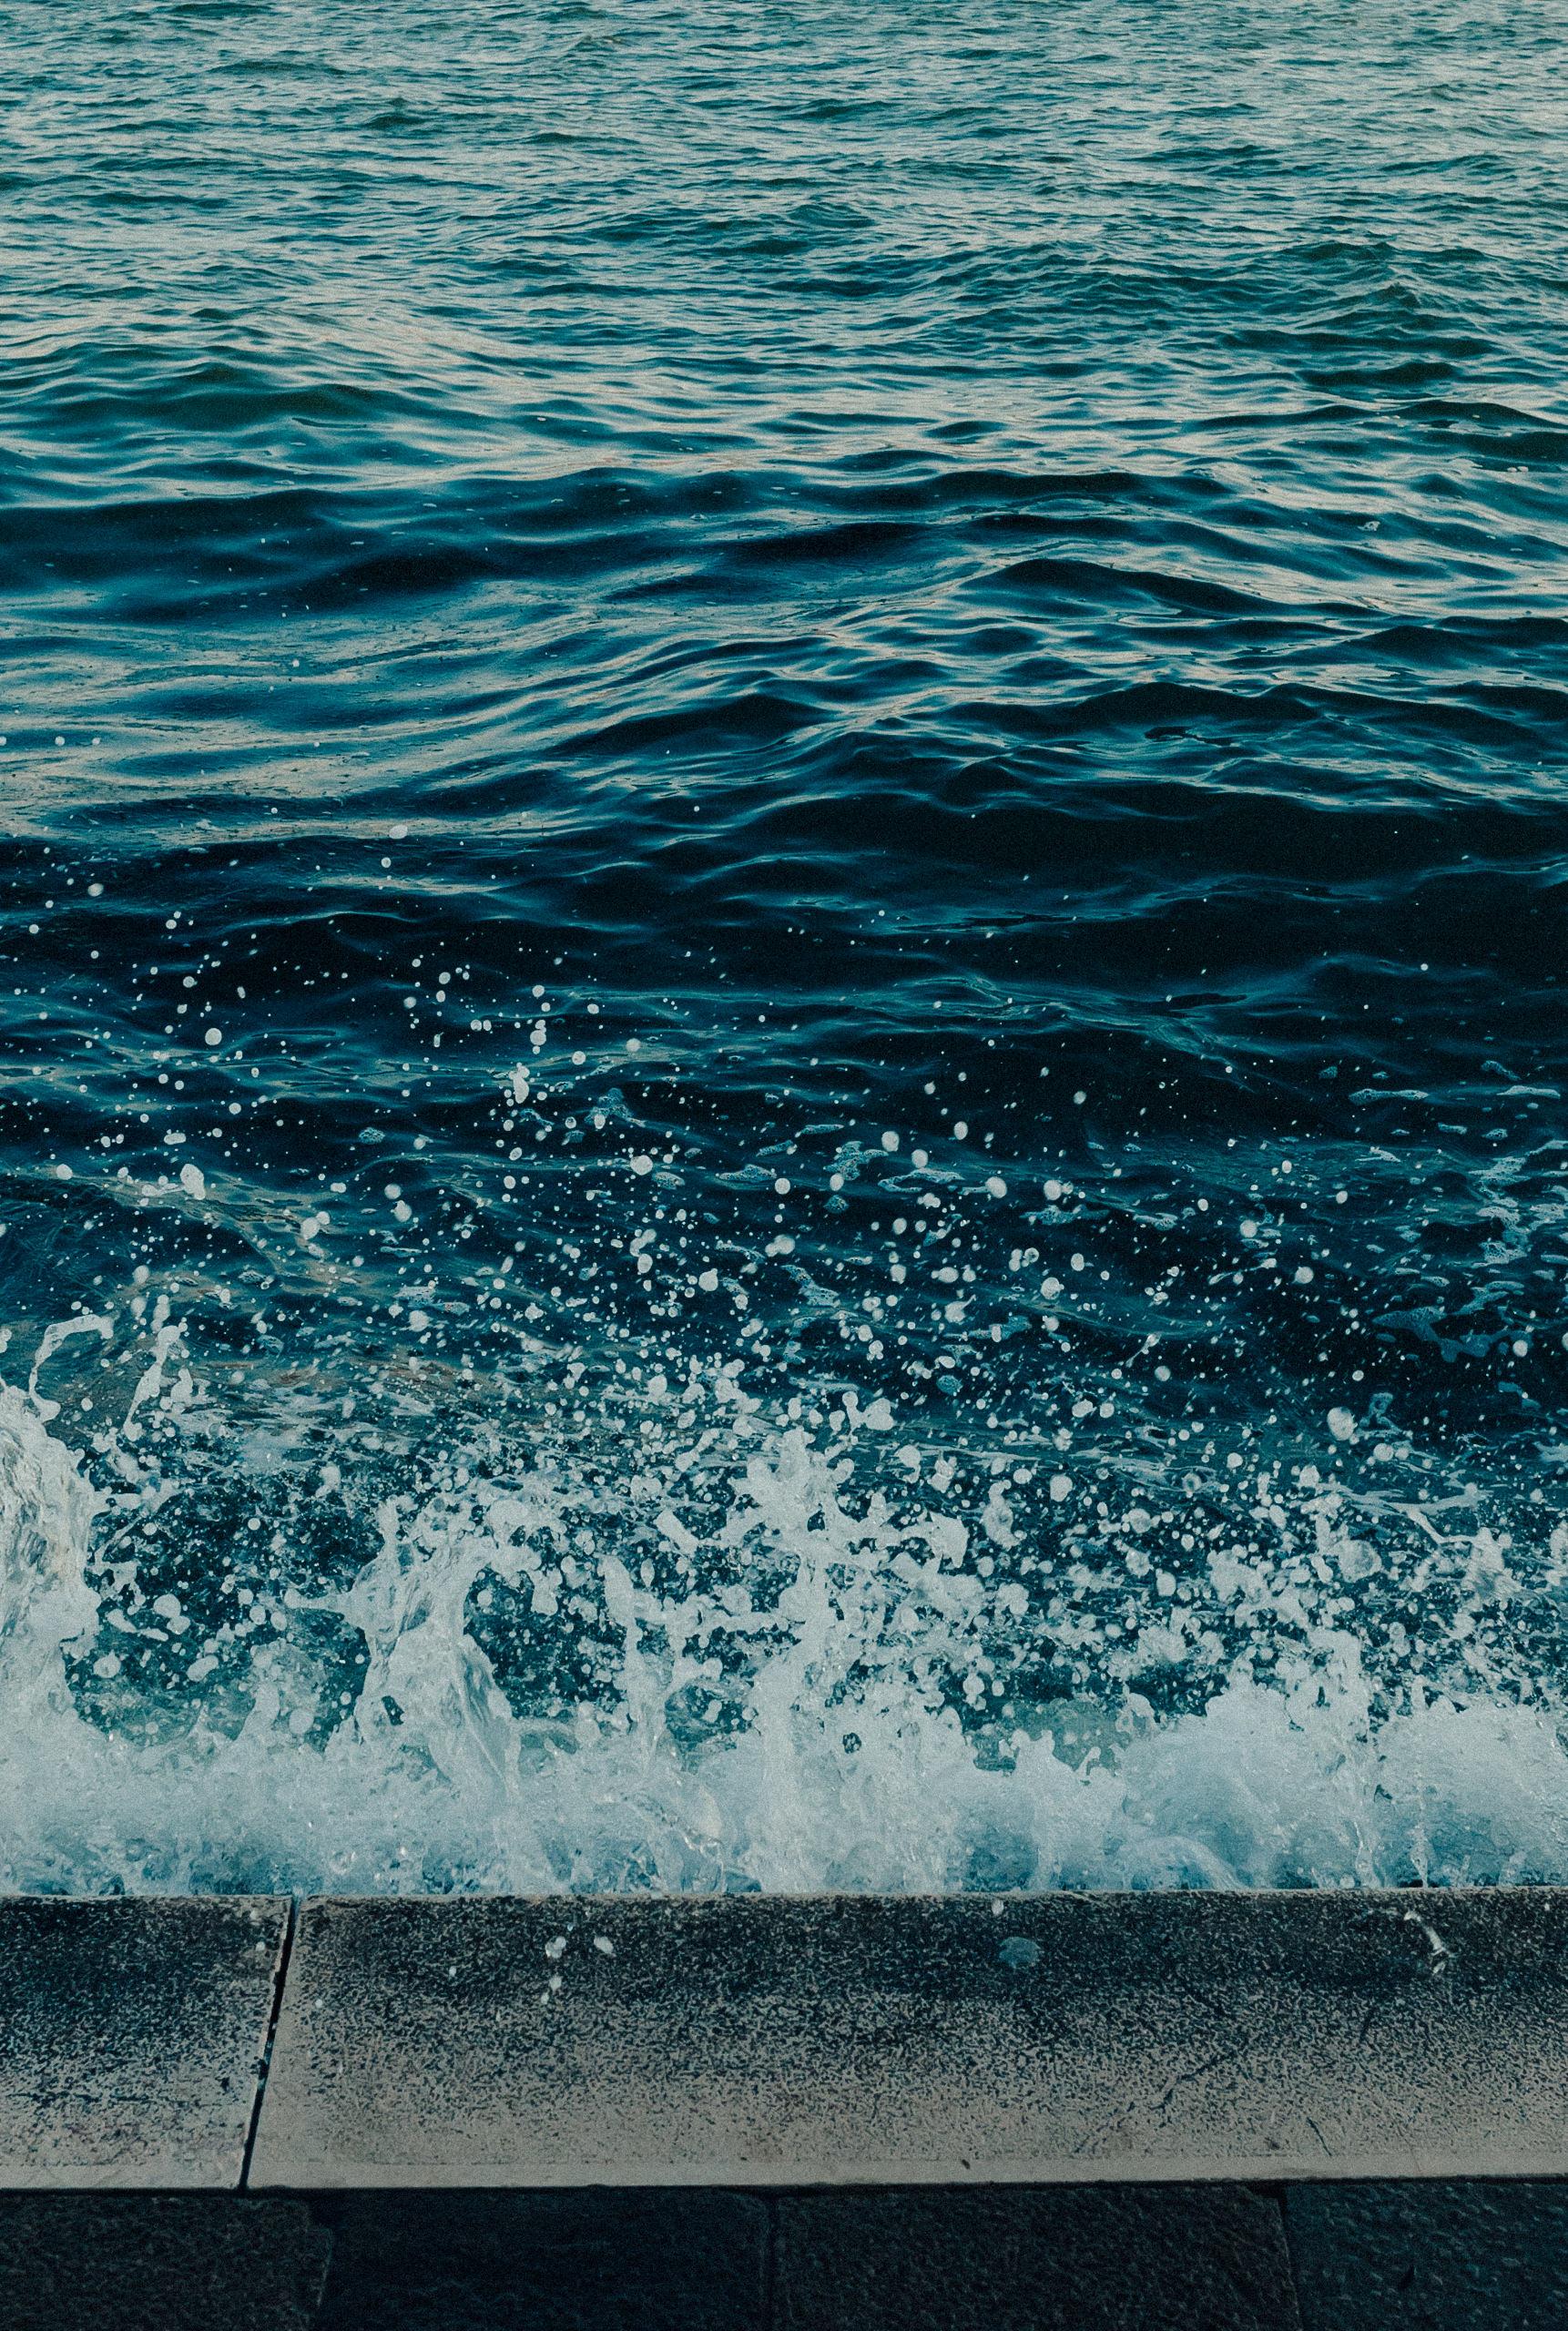 italy_travel_photography153.jpg